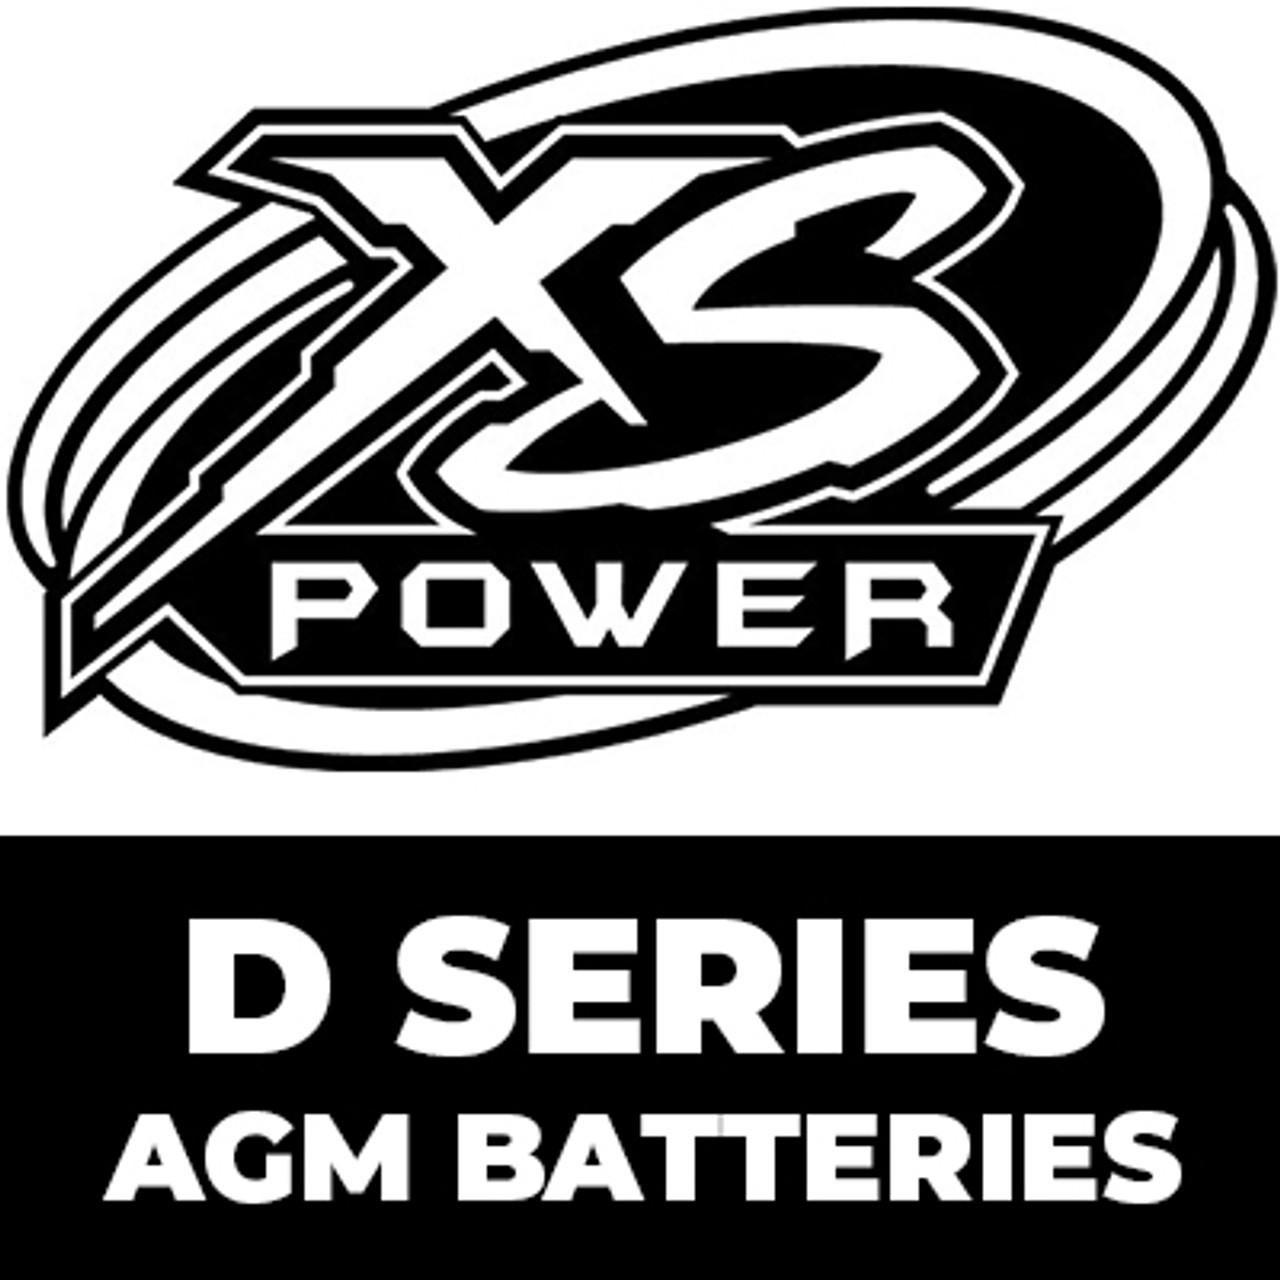 XS Power D Series AGM Batteries